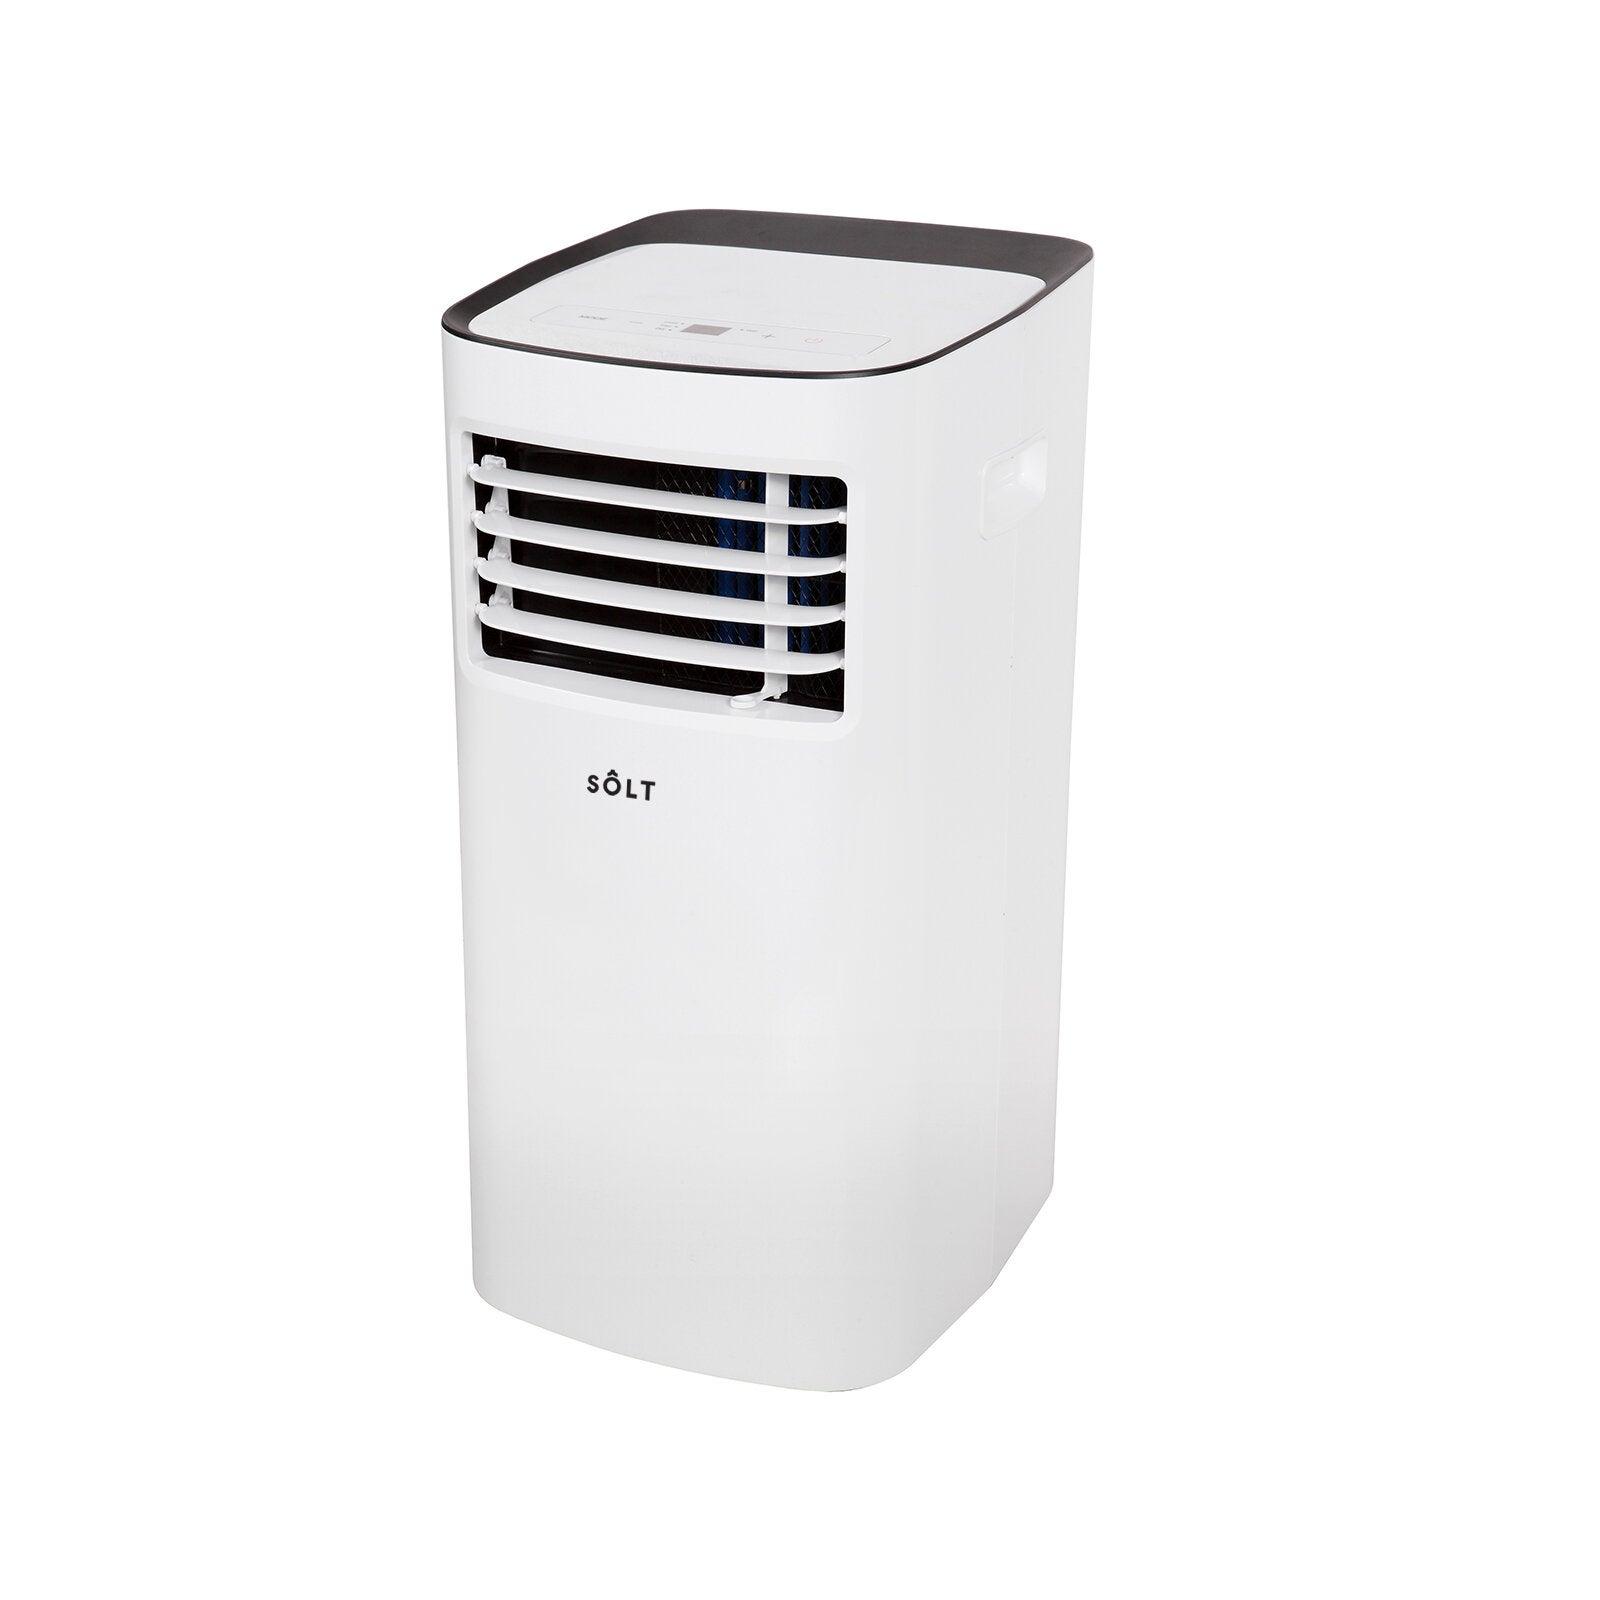 Solt GGSAP2560W Air Conditioner